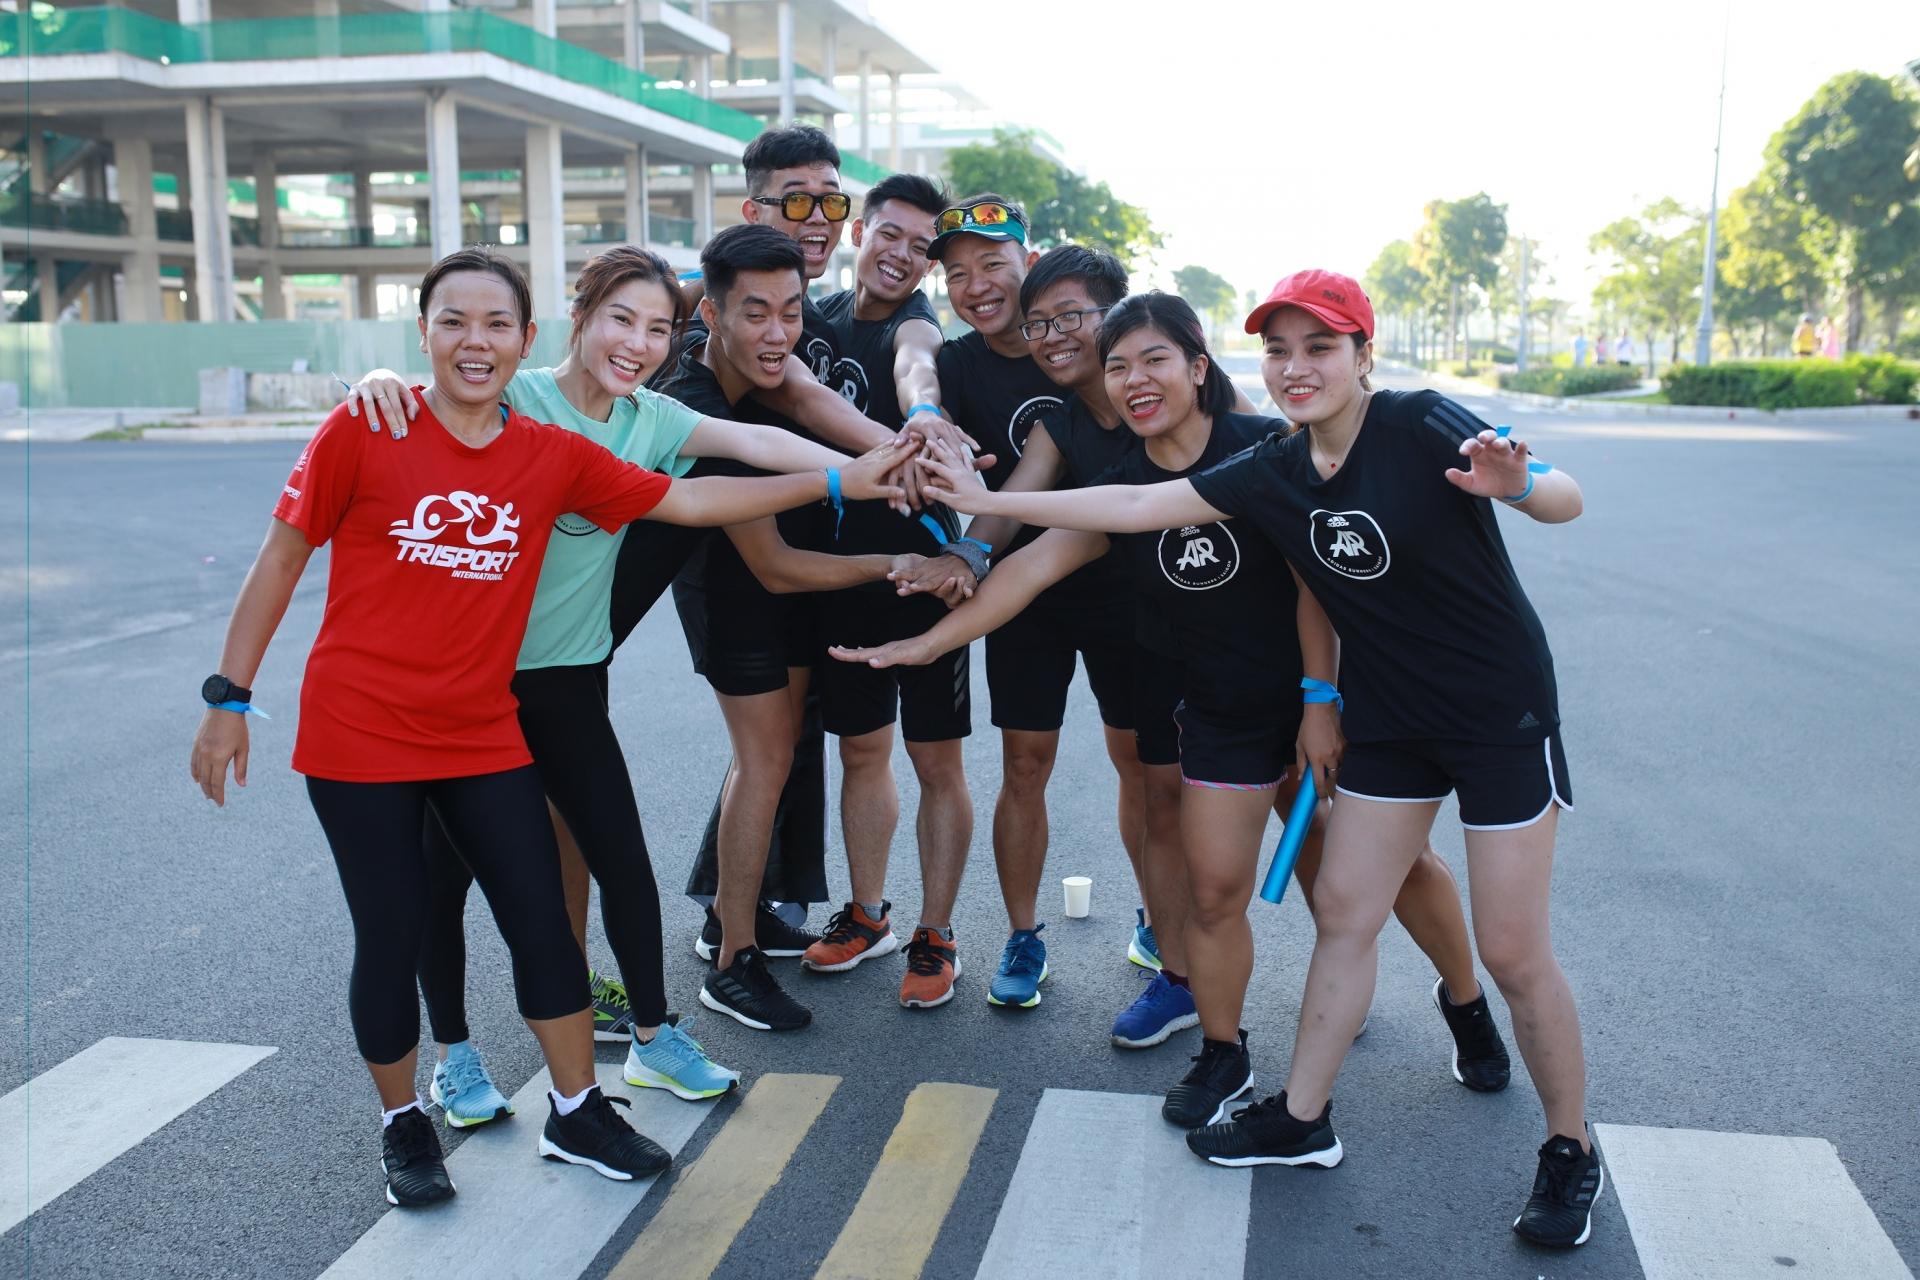 a02590a33cf8 Adidas Runners Saigon  experience running with NASA technology